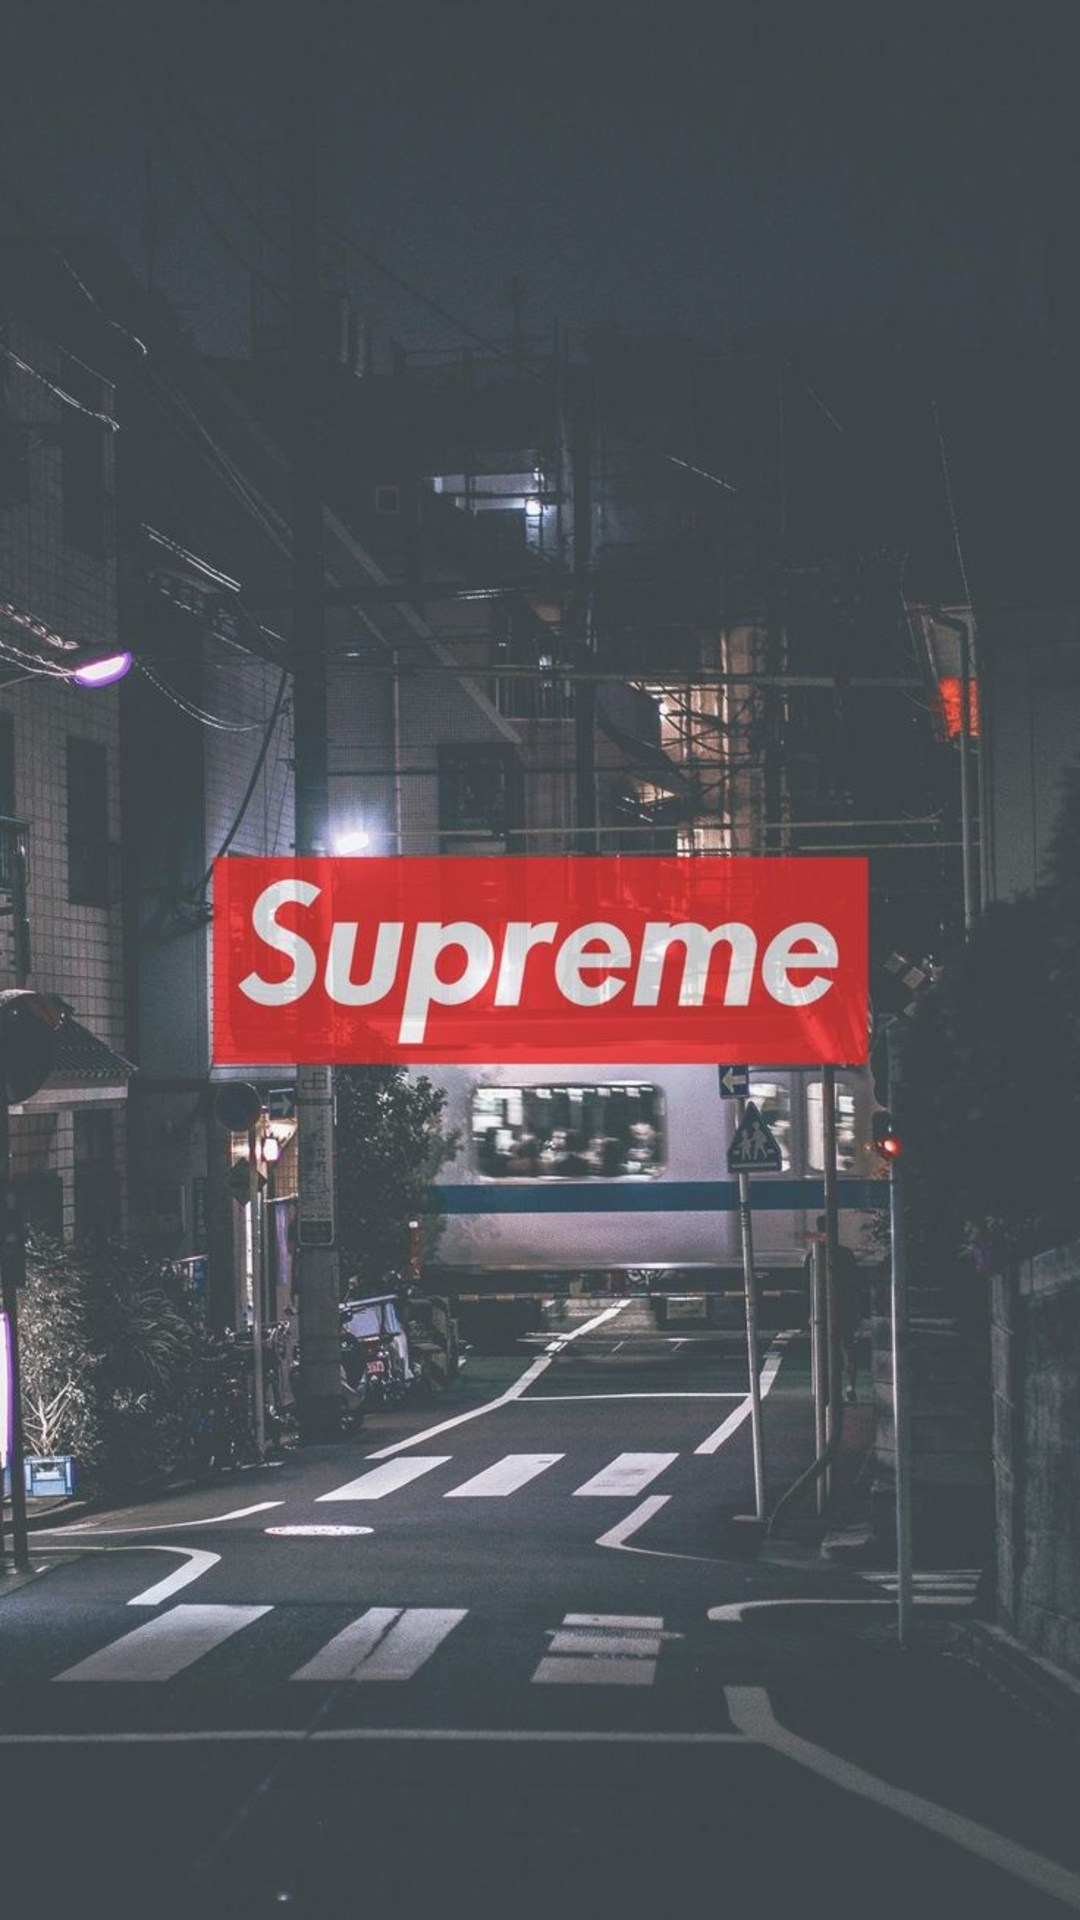 Plus Hypebeast Supreme Logos Wallpaper wwwgalleryneedcom 1080x1920